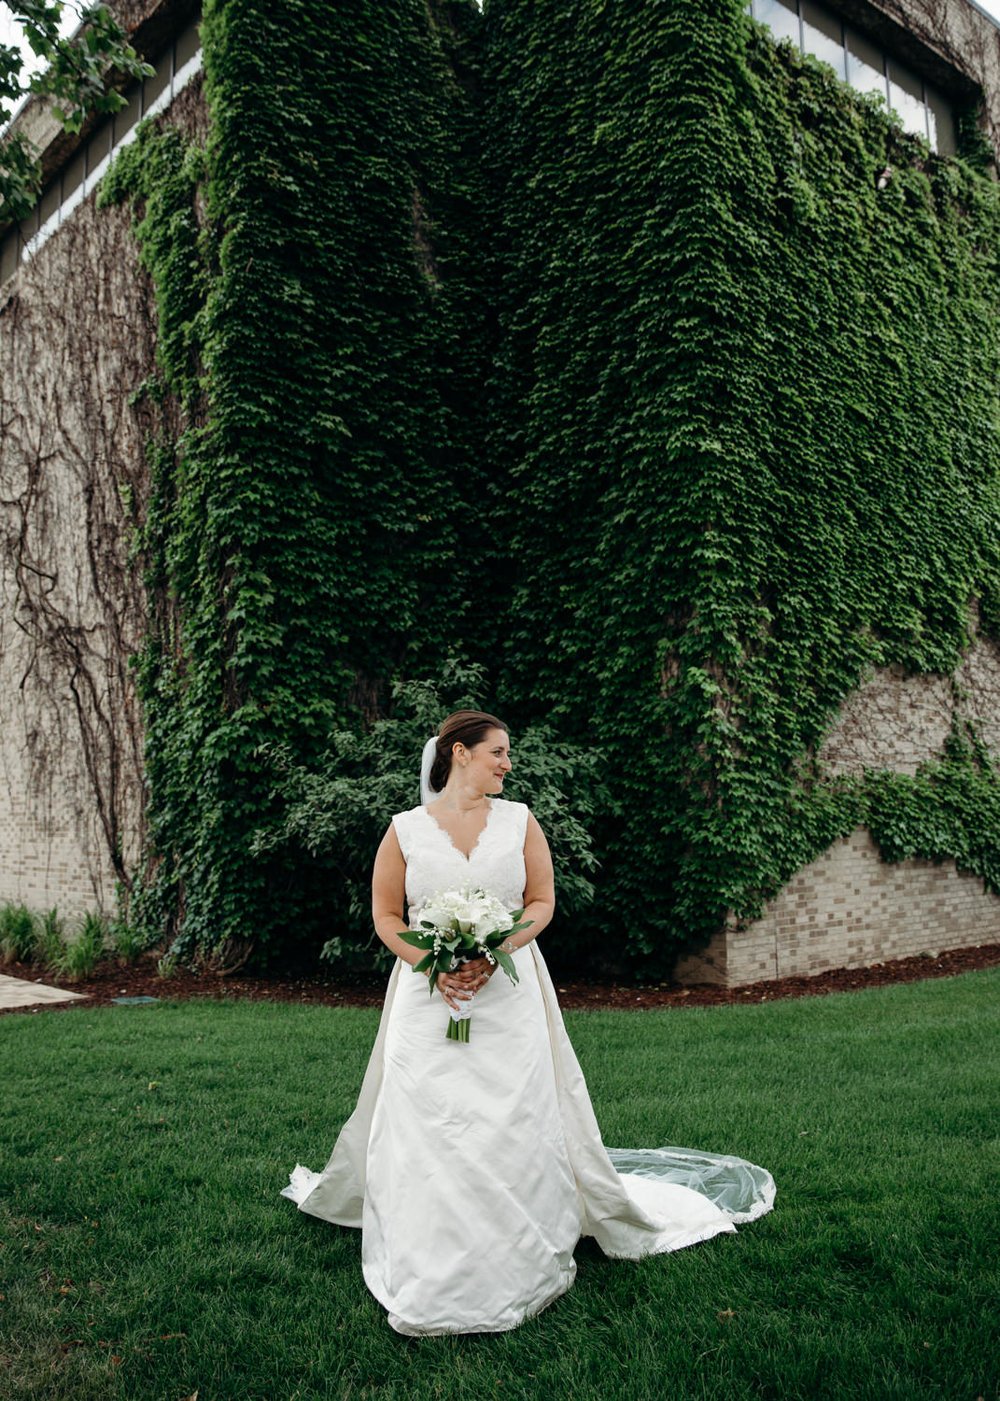 Grant Beachy photographer dance action portrait wedding elkhart goshen south bend chicago-5334.jpg